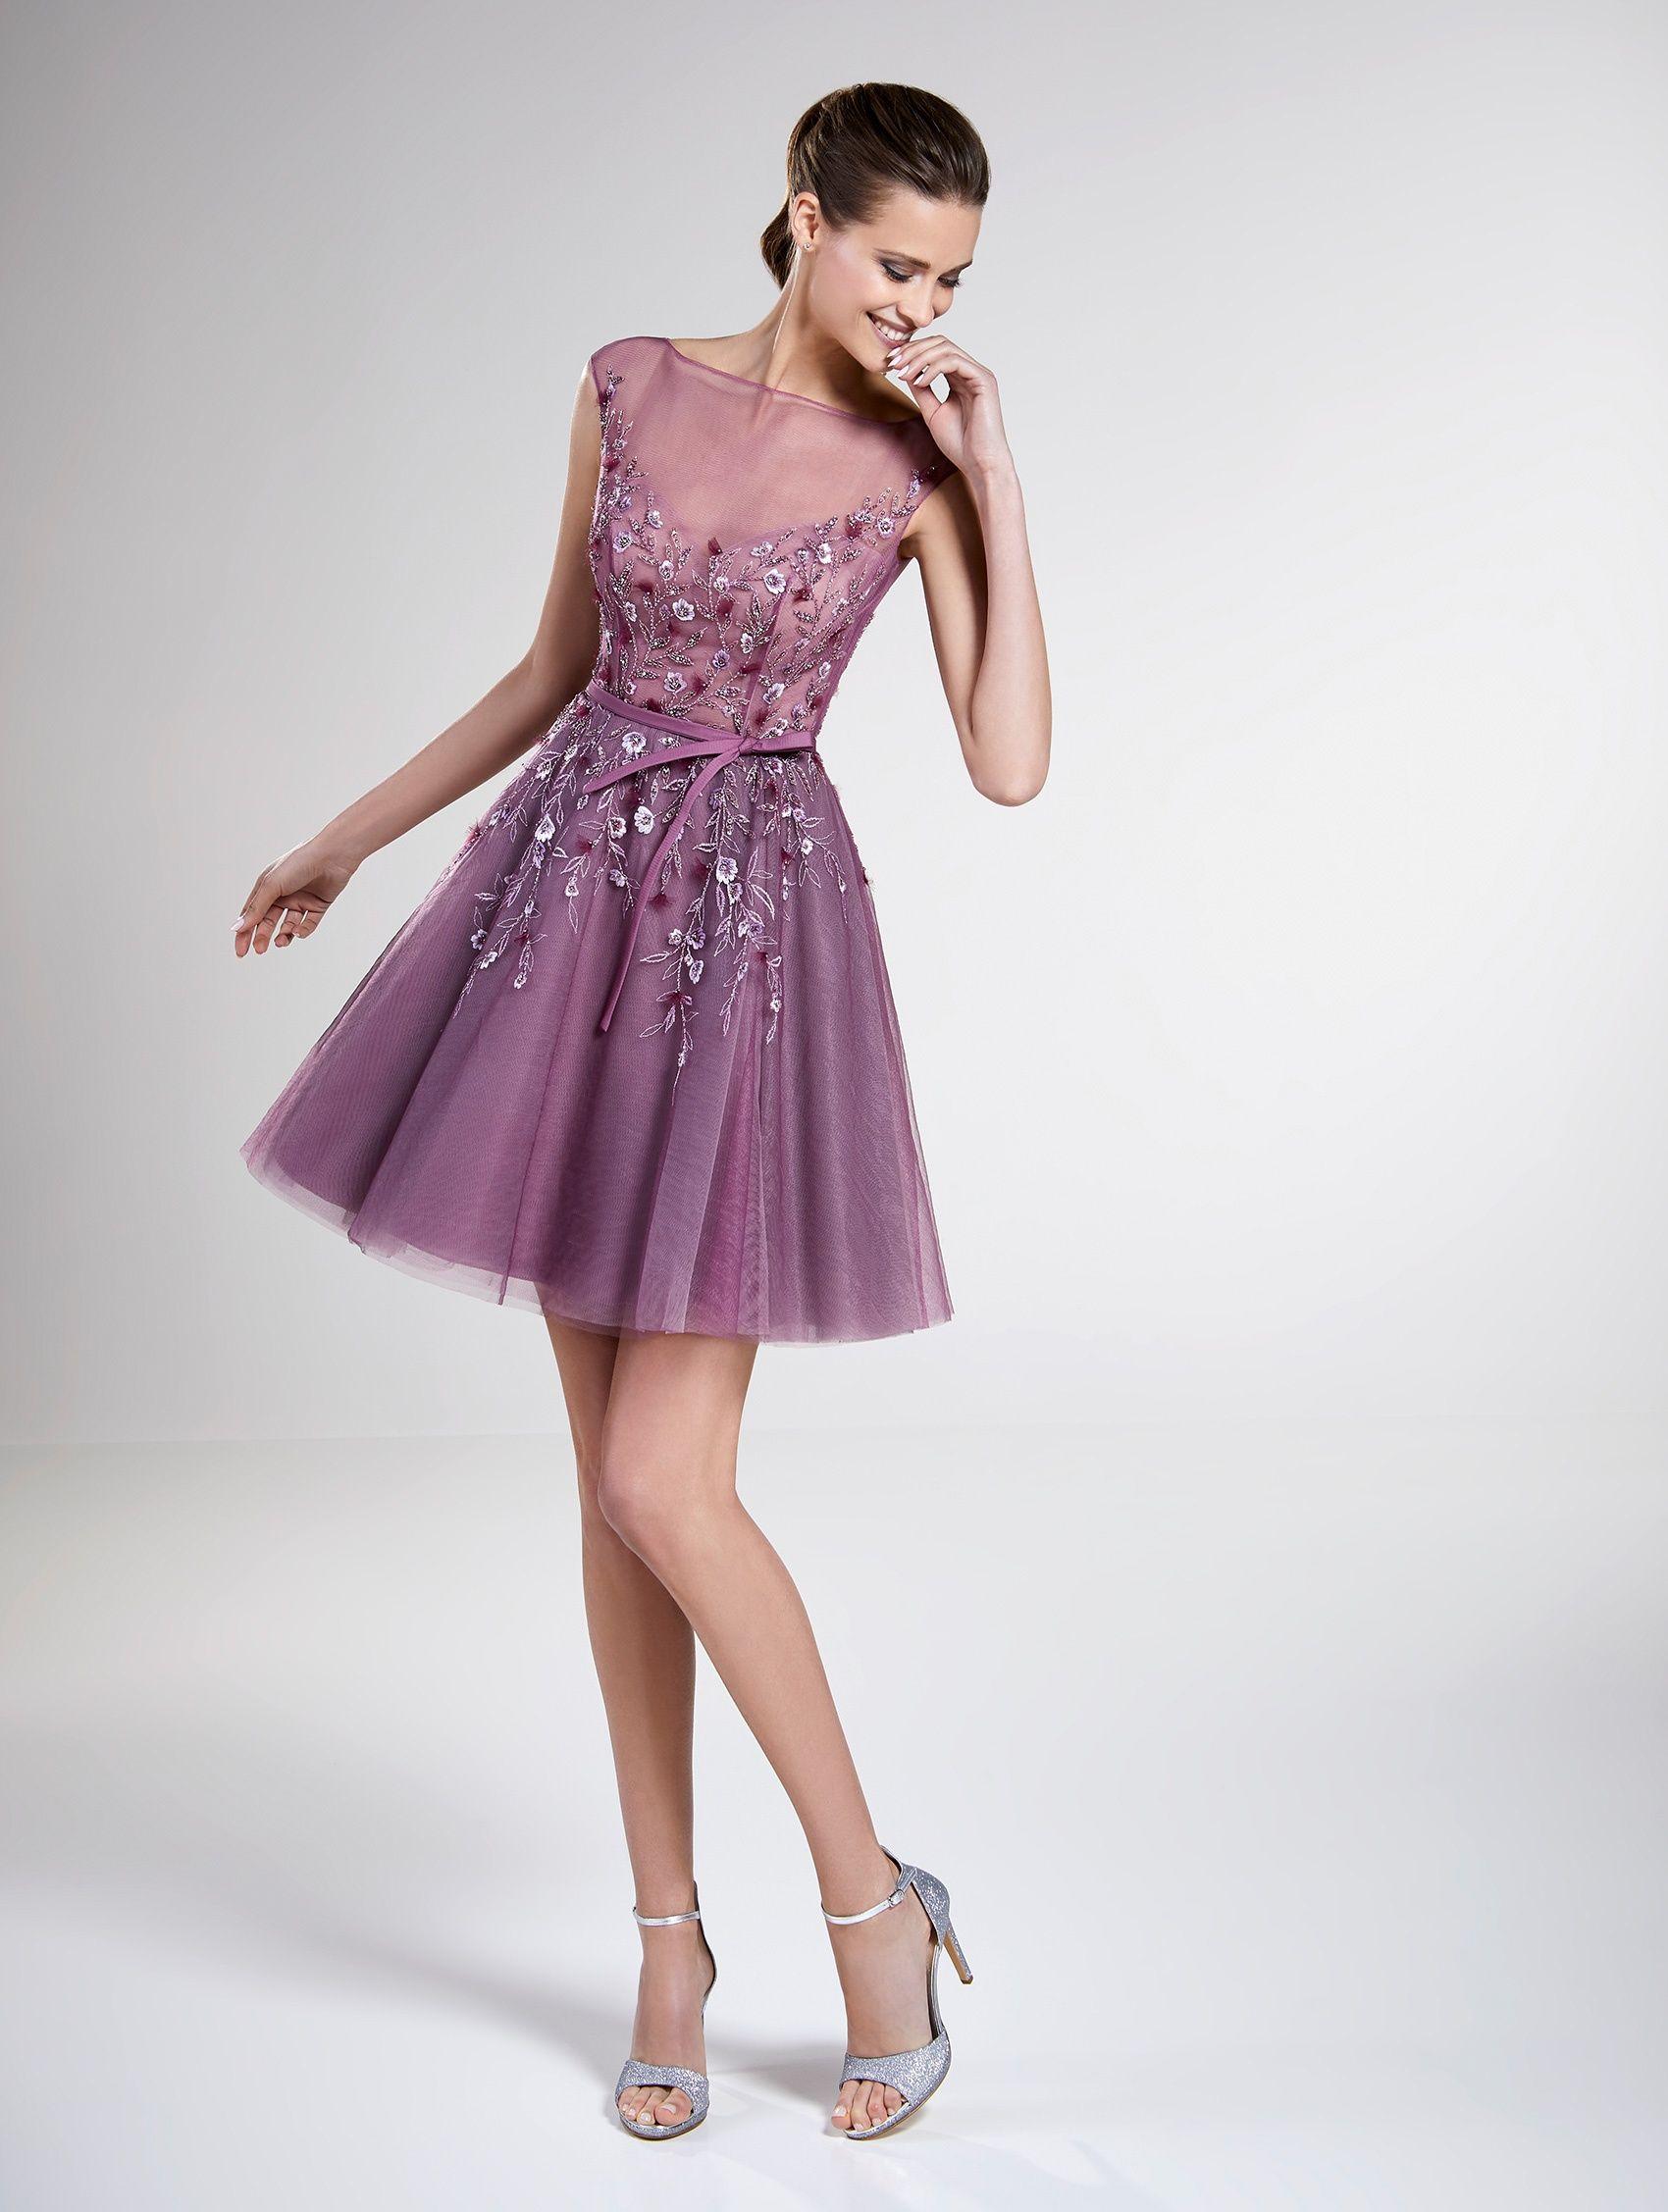 Famoso Vestido De Novia De Flamenca Inspiración - Vestido de Novia ...